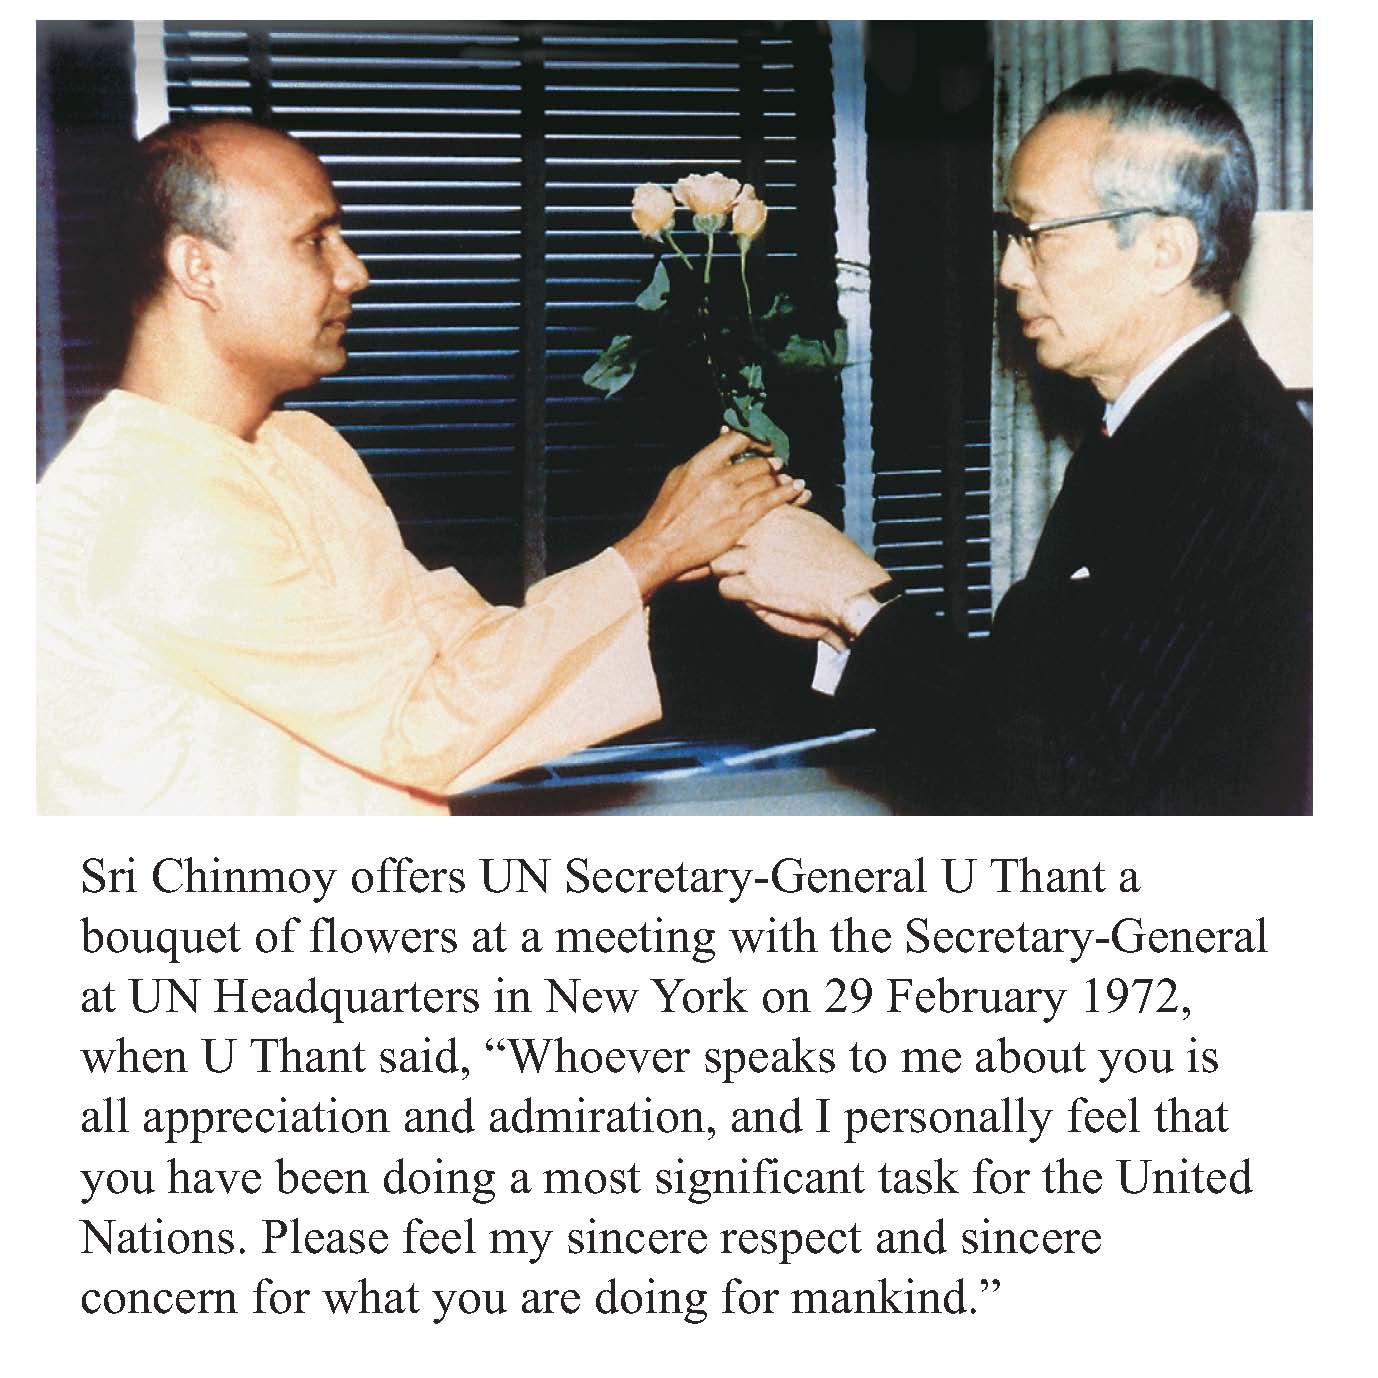 U Thant and Sri Chinmoy